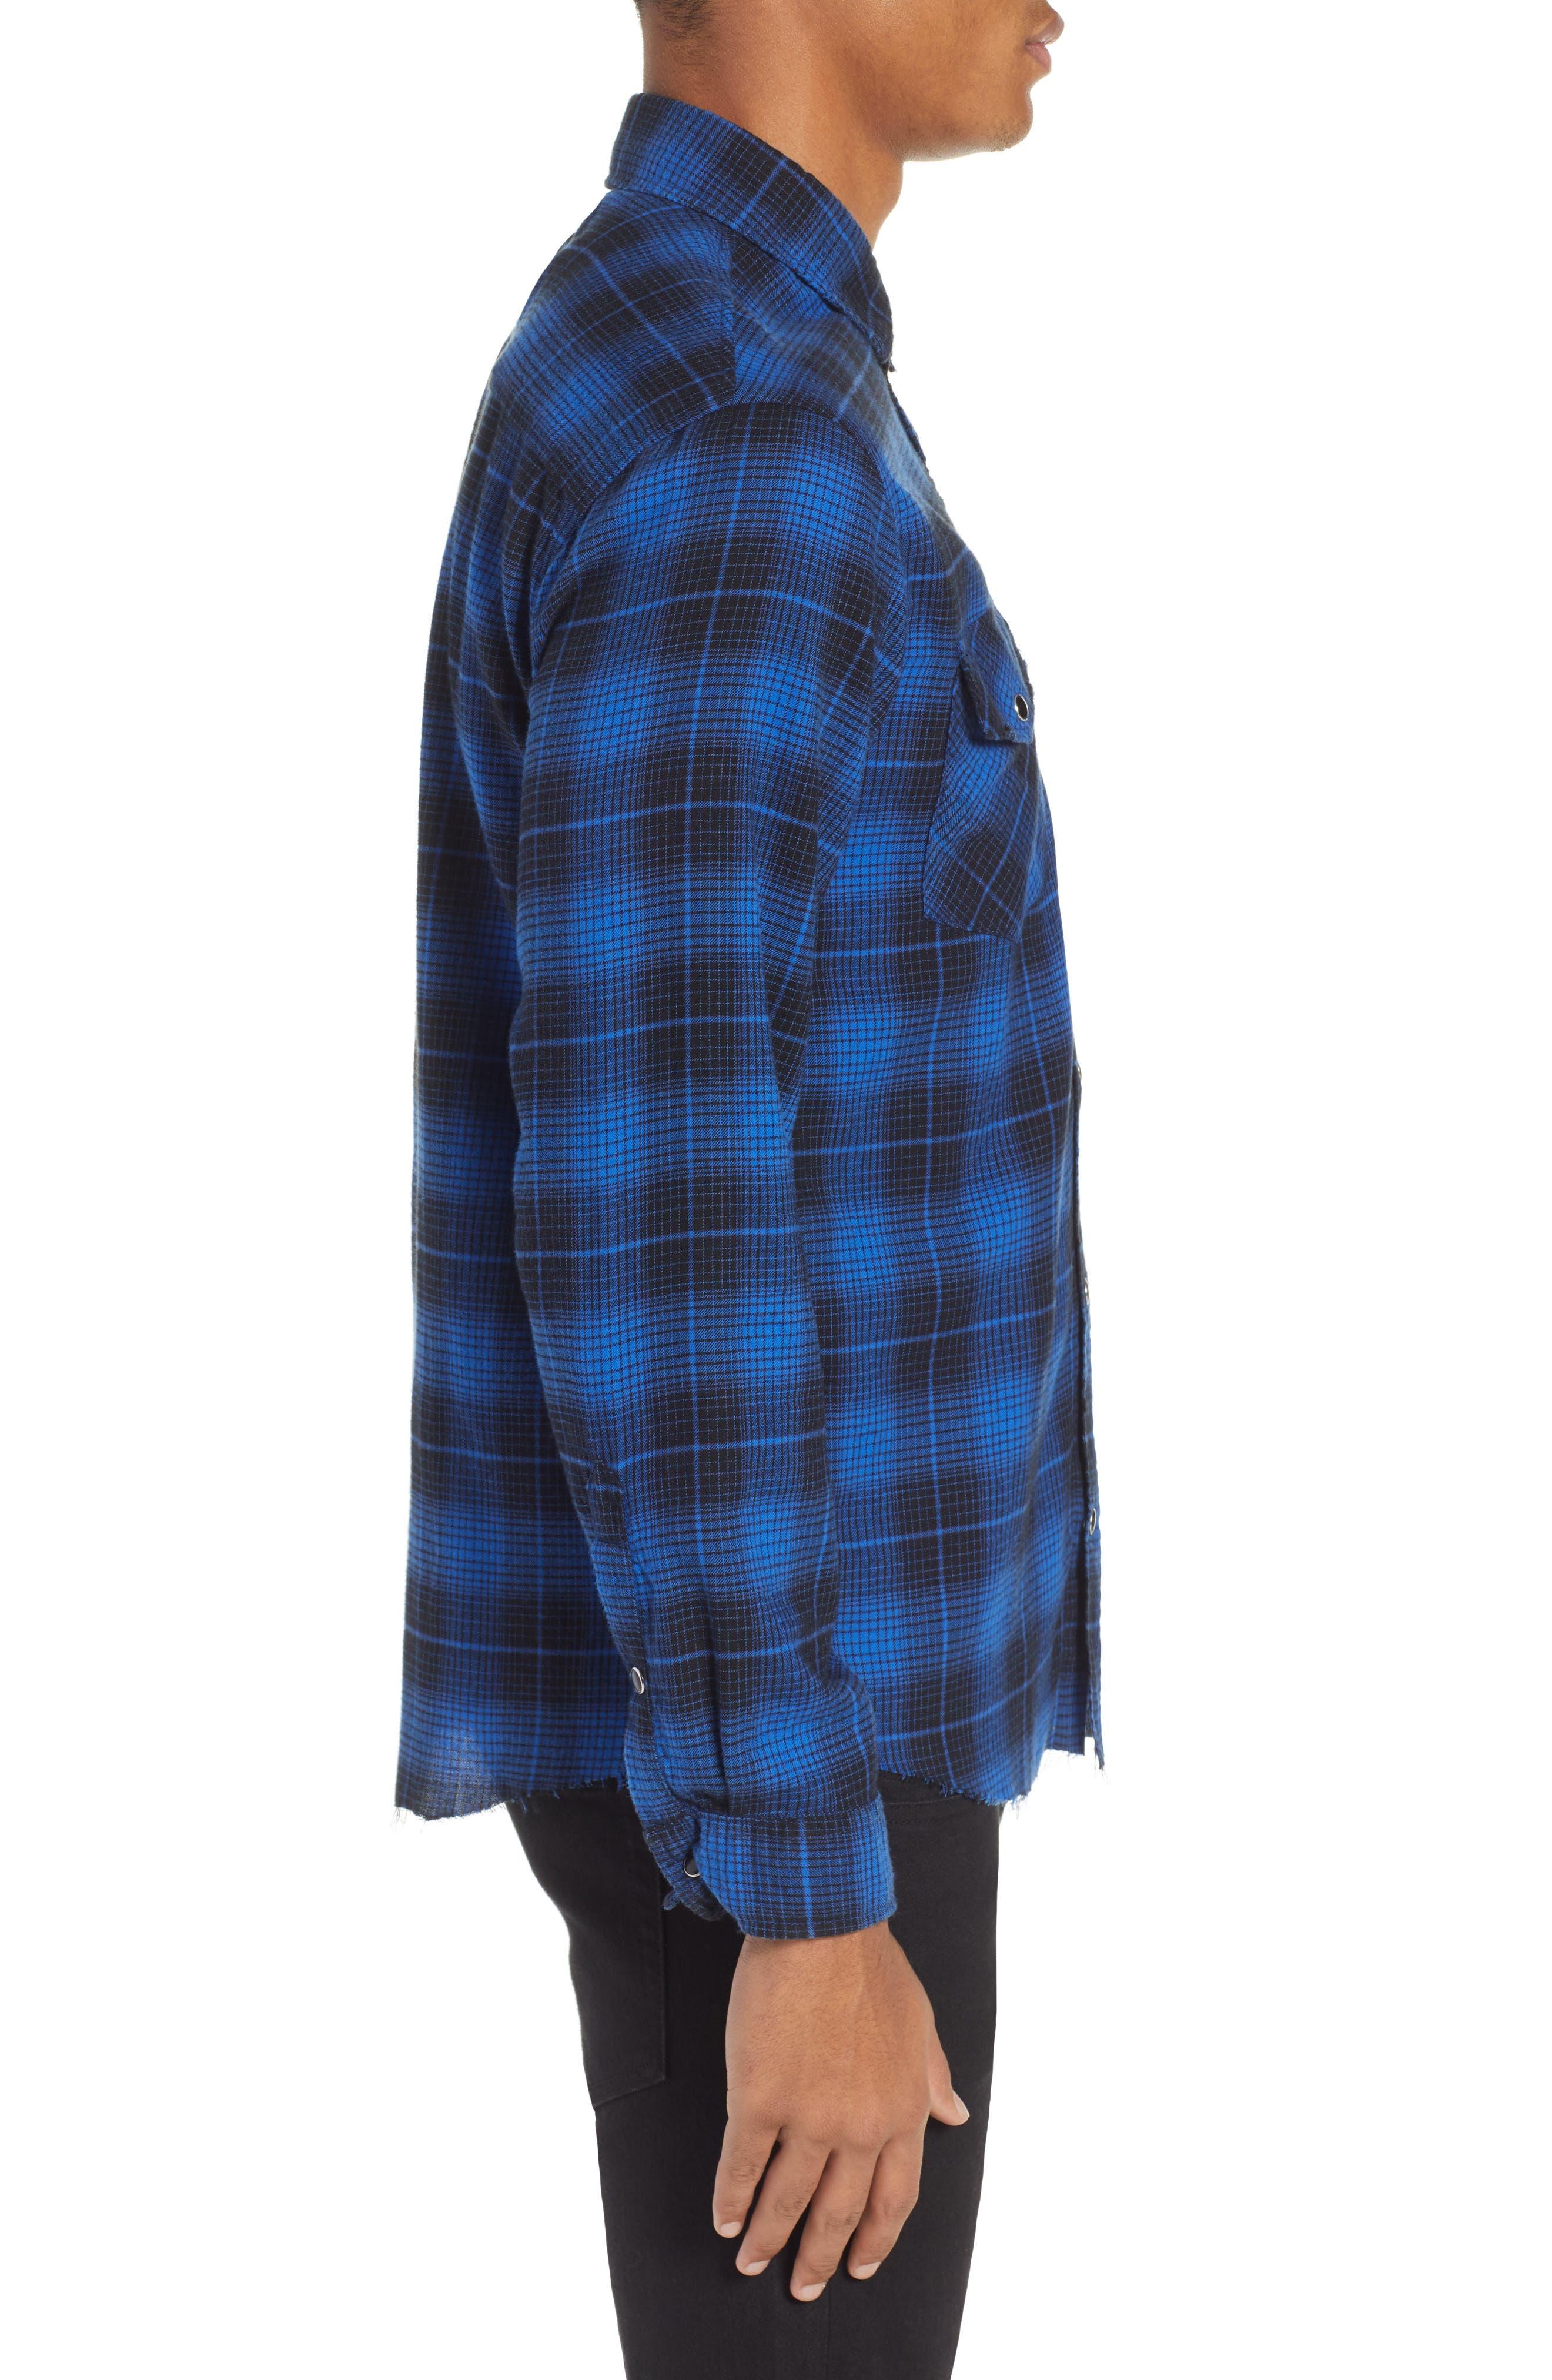 THE KOOPLES, Plaid Flannel Shirt, Alternate thumbnail 4, color, 400